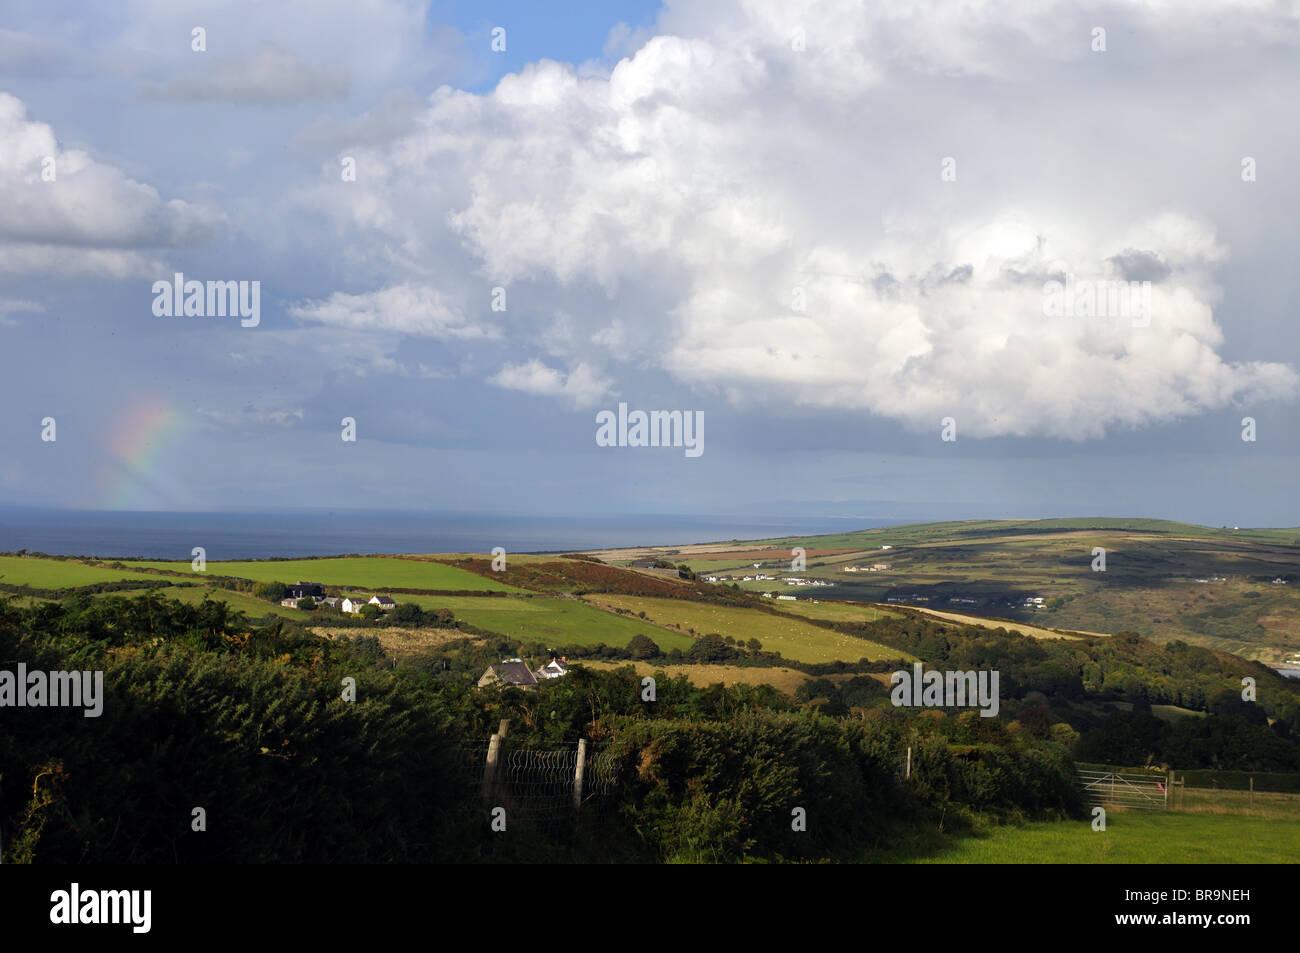 Cumulonimbus cloud and rainbow, Cardigan Bay, St Dogmaels, River Teifi, Pembrokeshire, Wales, United Kingdom - Stock Image